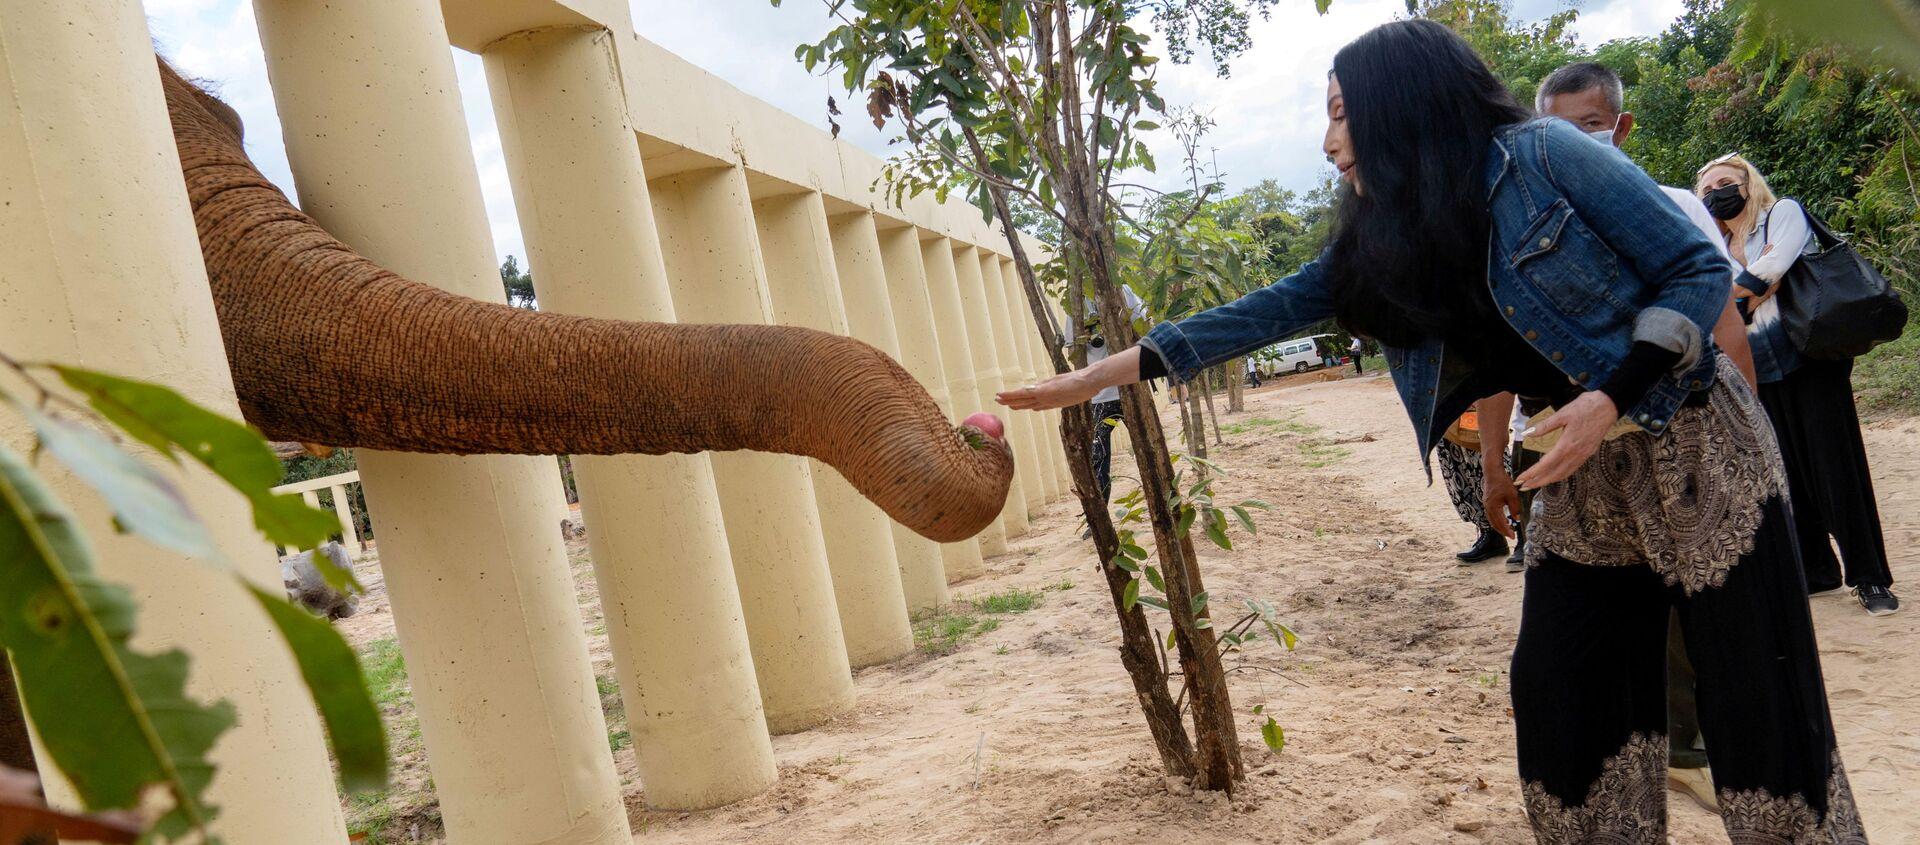 Elefante Kaavan in Cambogia - Sputnik Italia, 1920, 23.12.2020